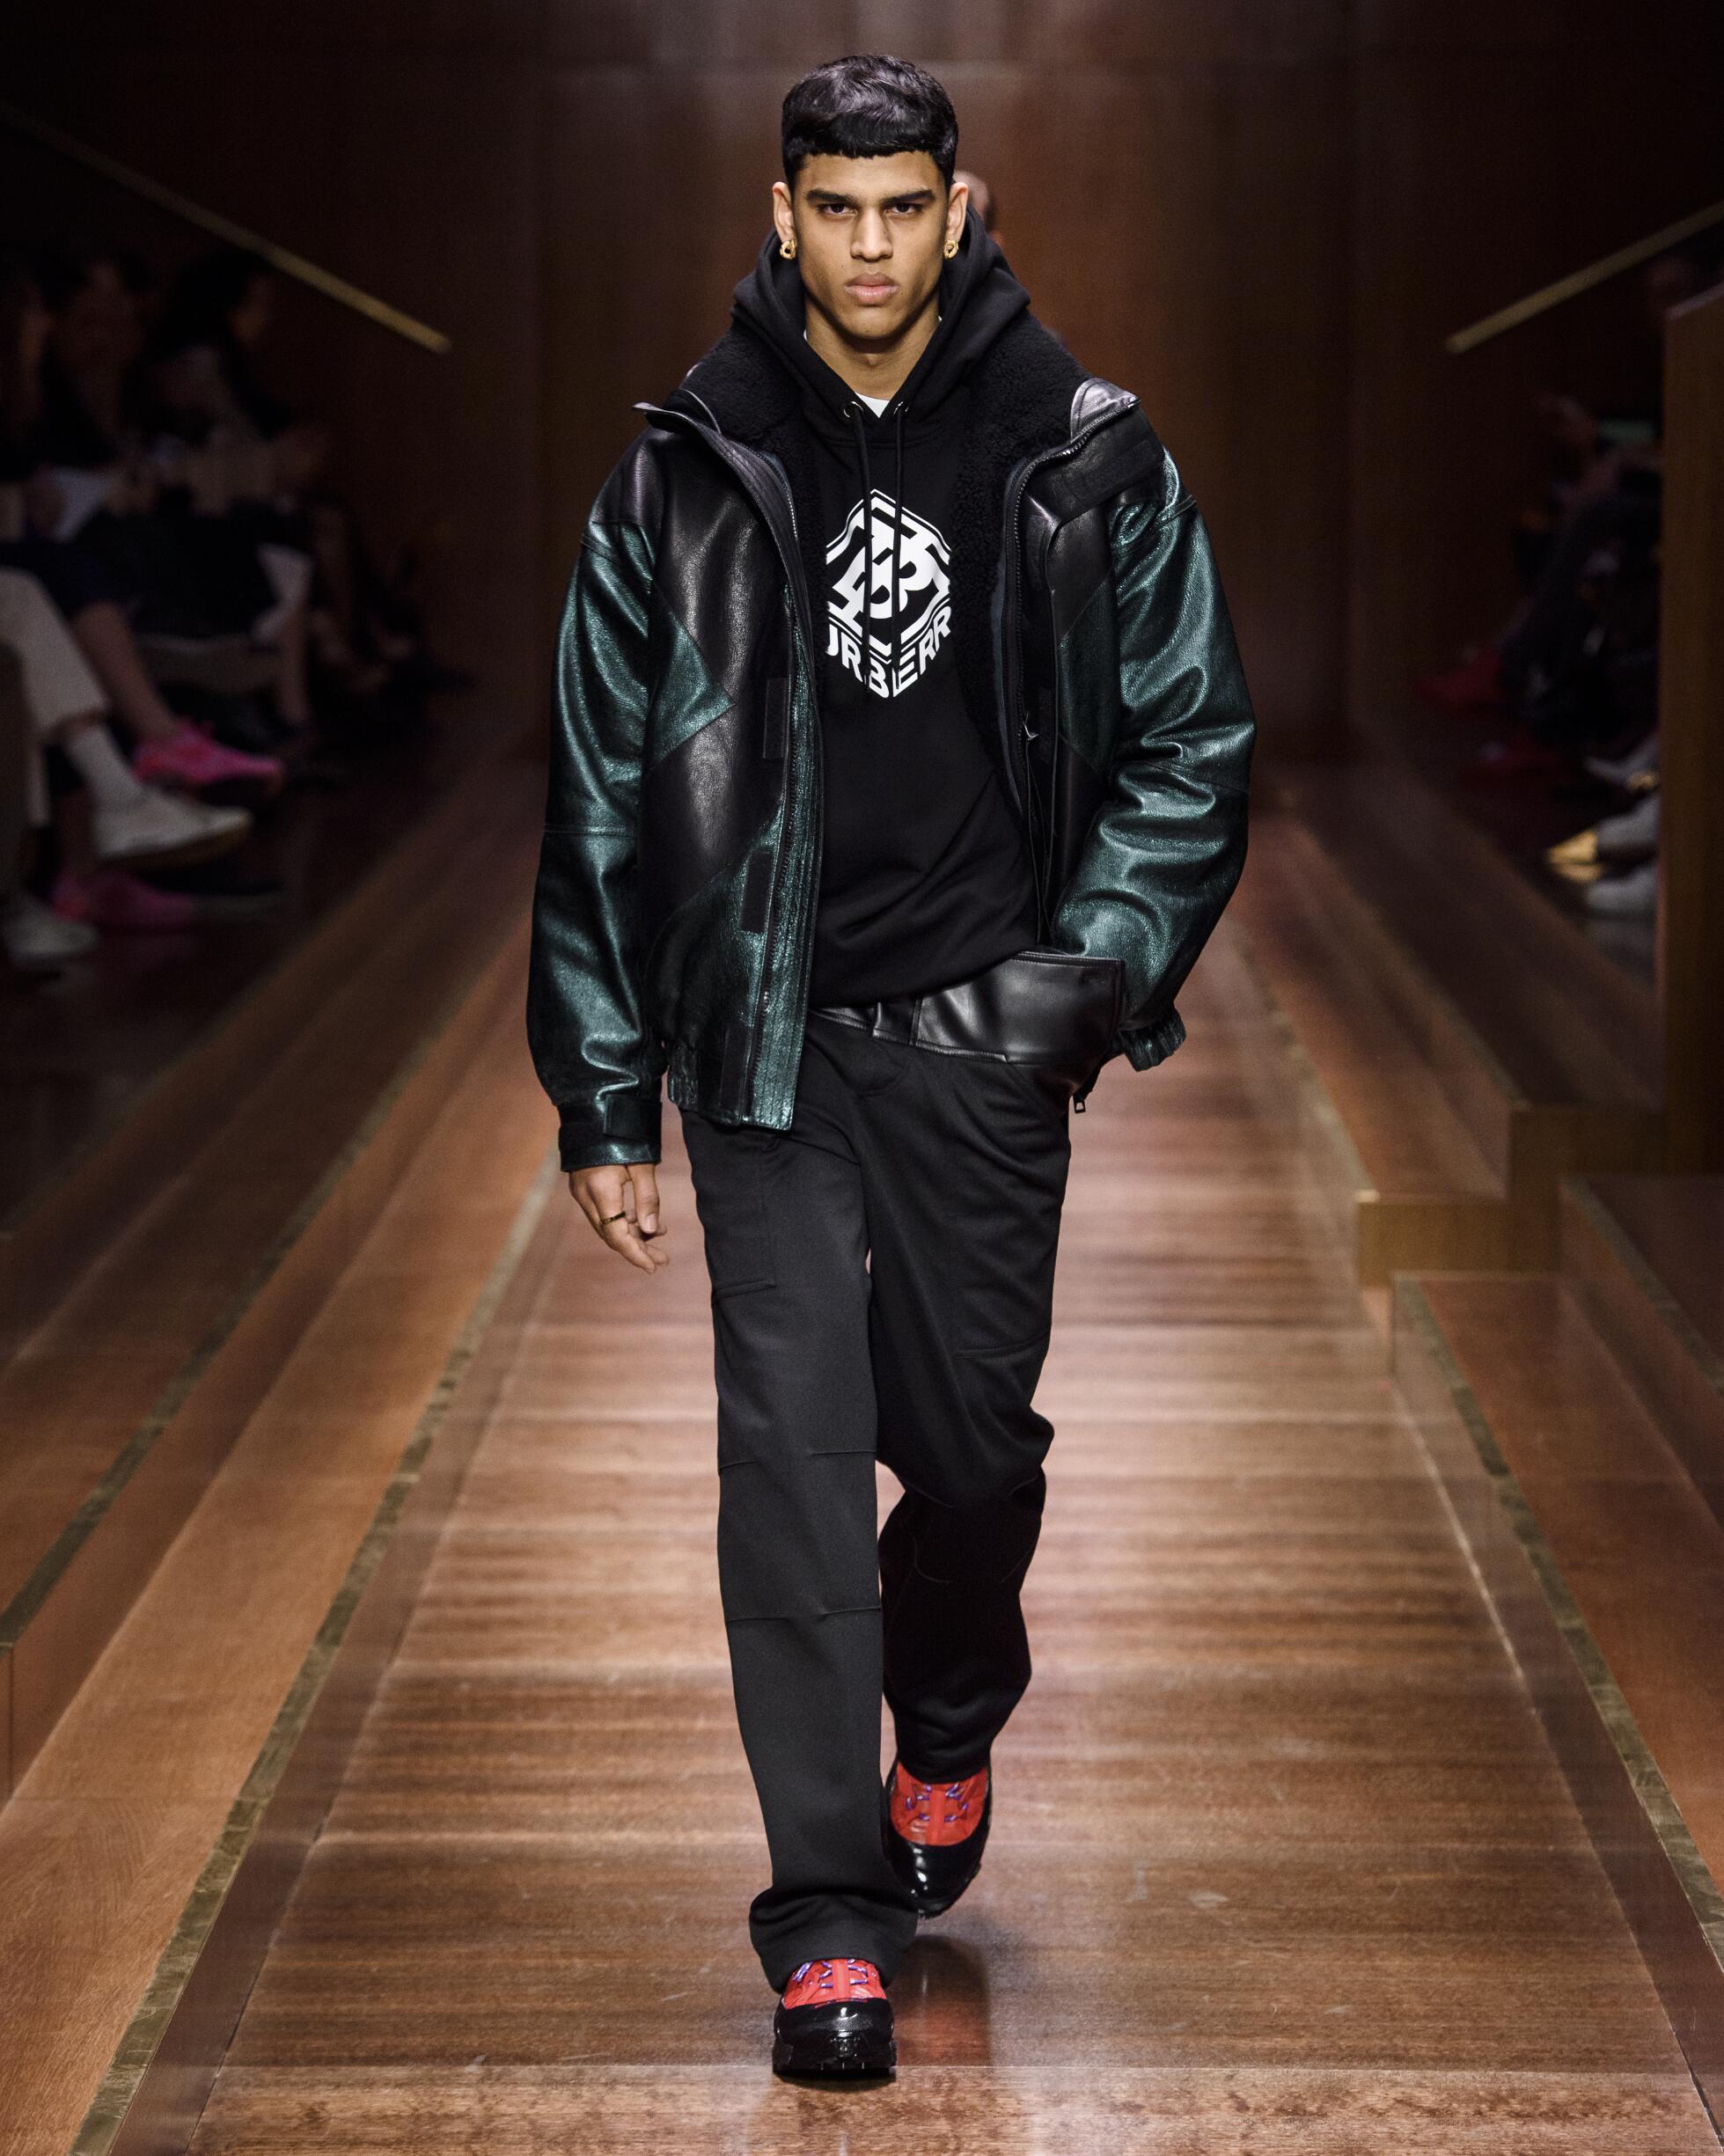 Man FW 2019 Burberry Show London Fashion Week